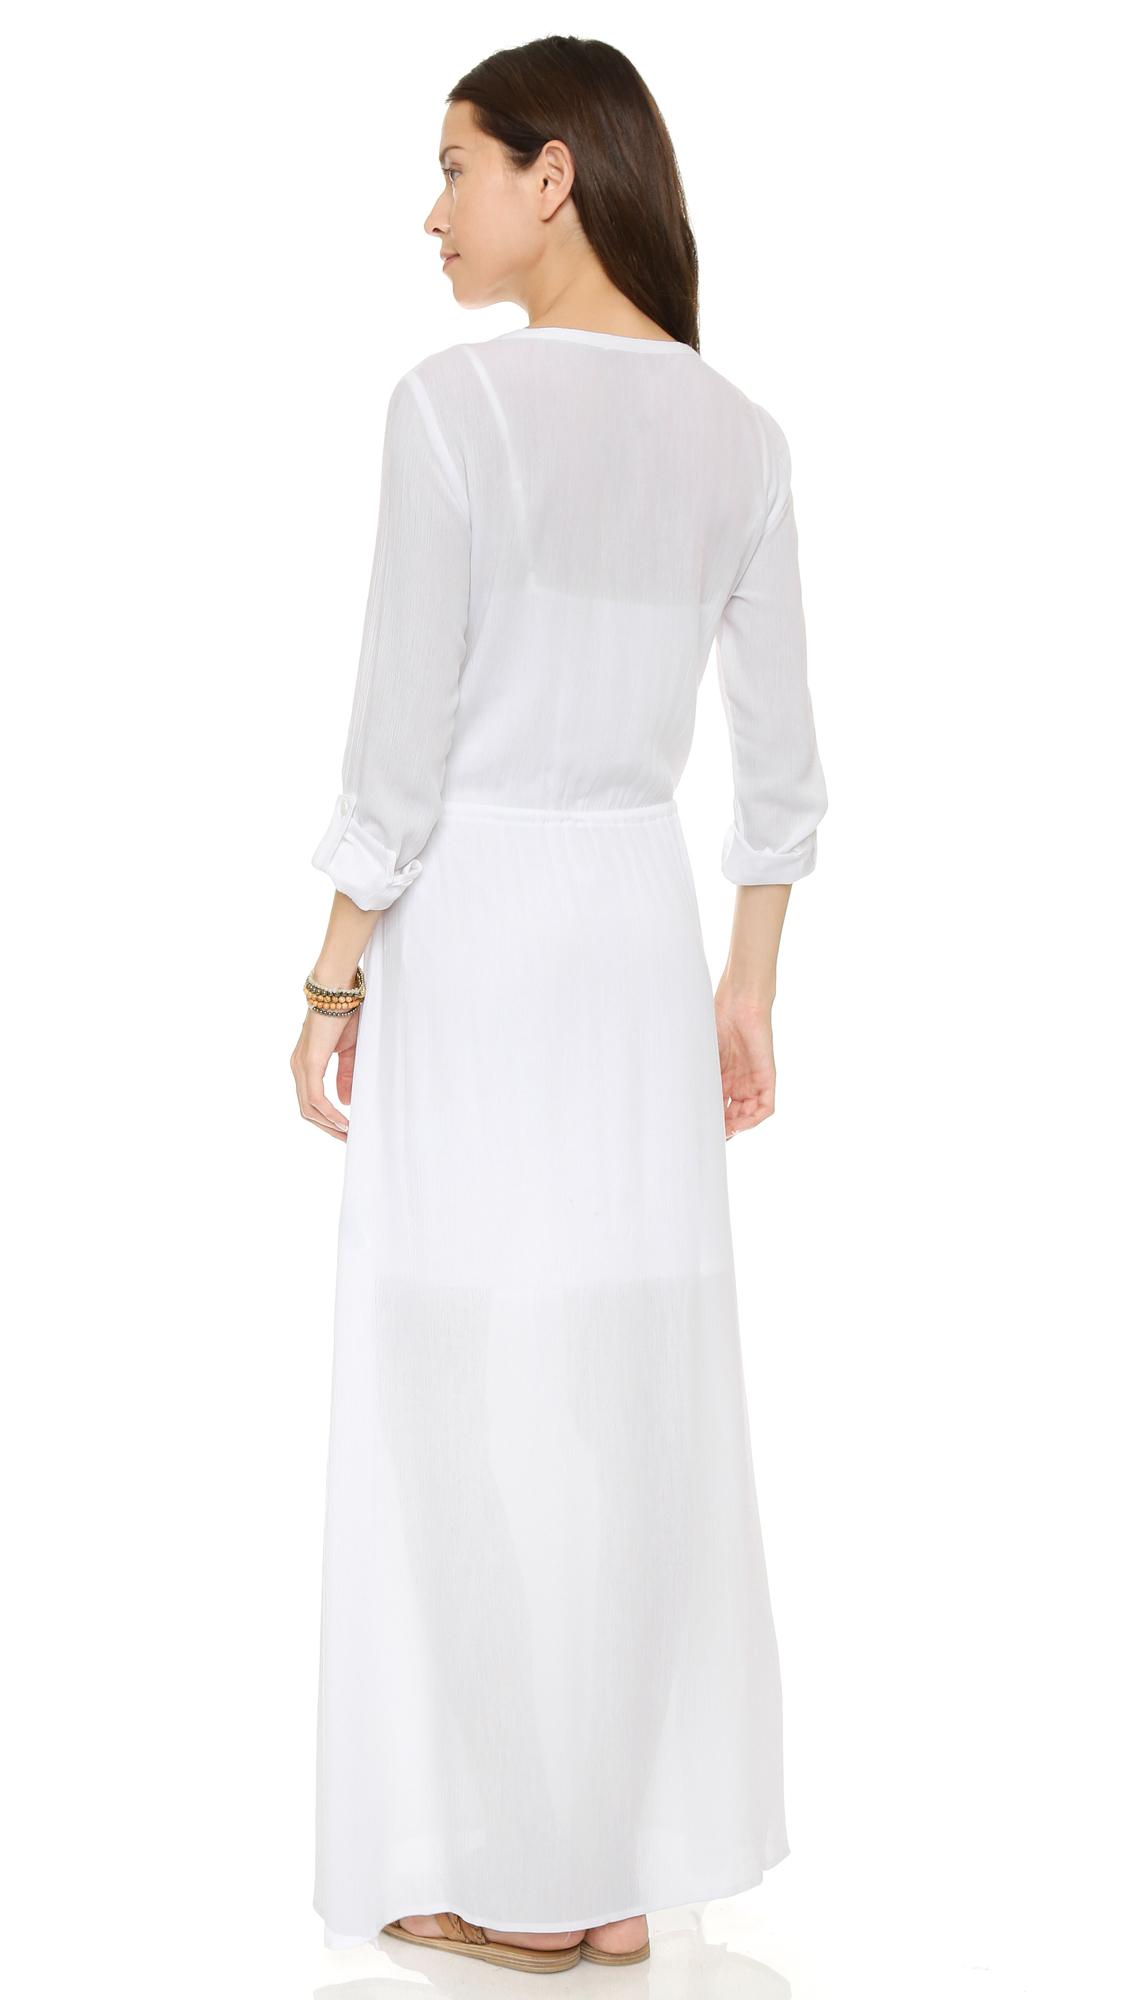 Gauze Maxi Shirt Dress - White